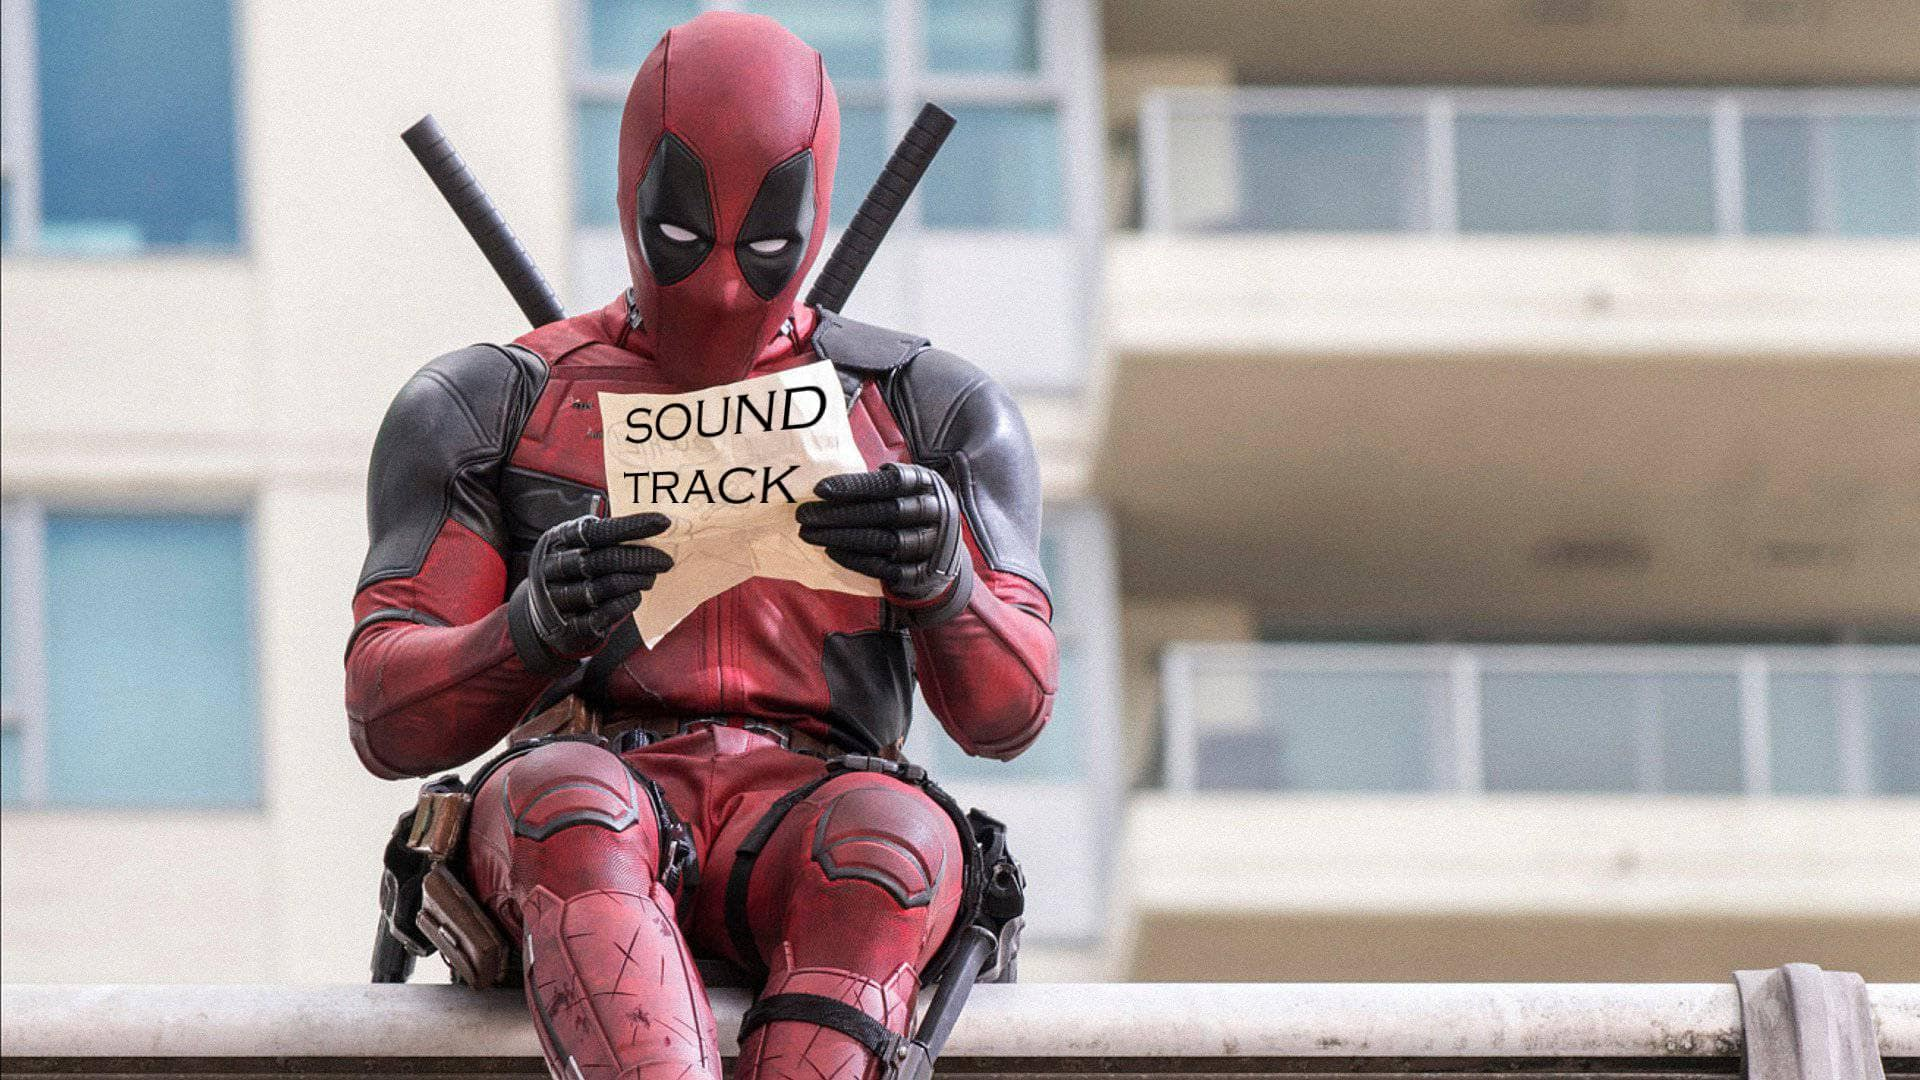 Саундтрек к фильму «Дэдпул» (Deadpool) слушать онлайн